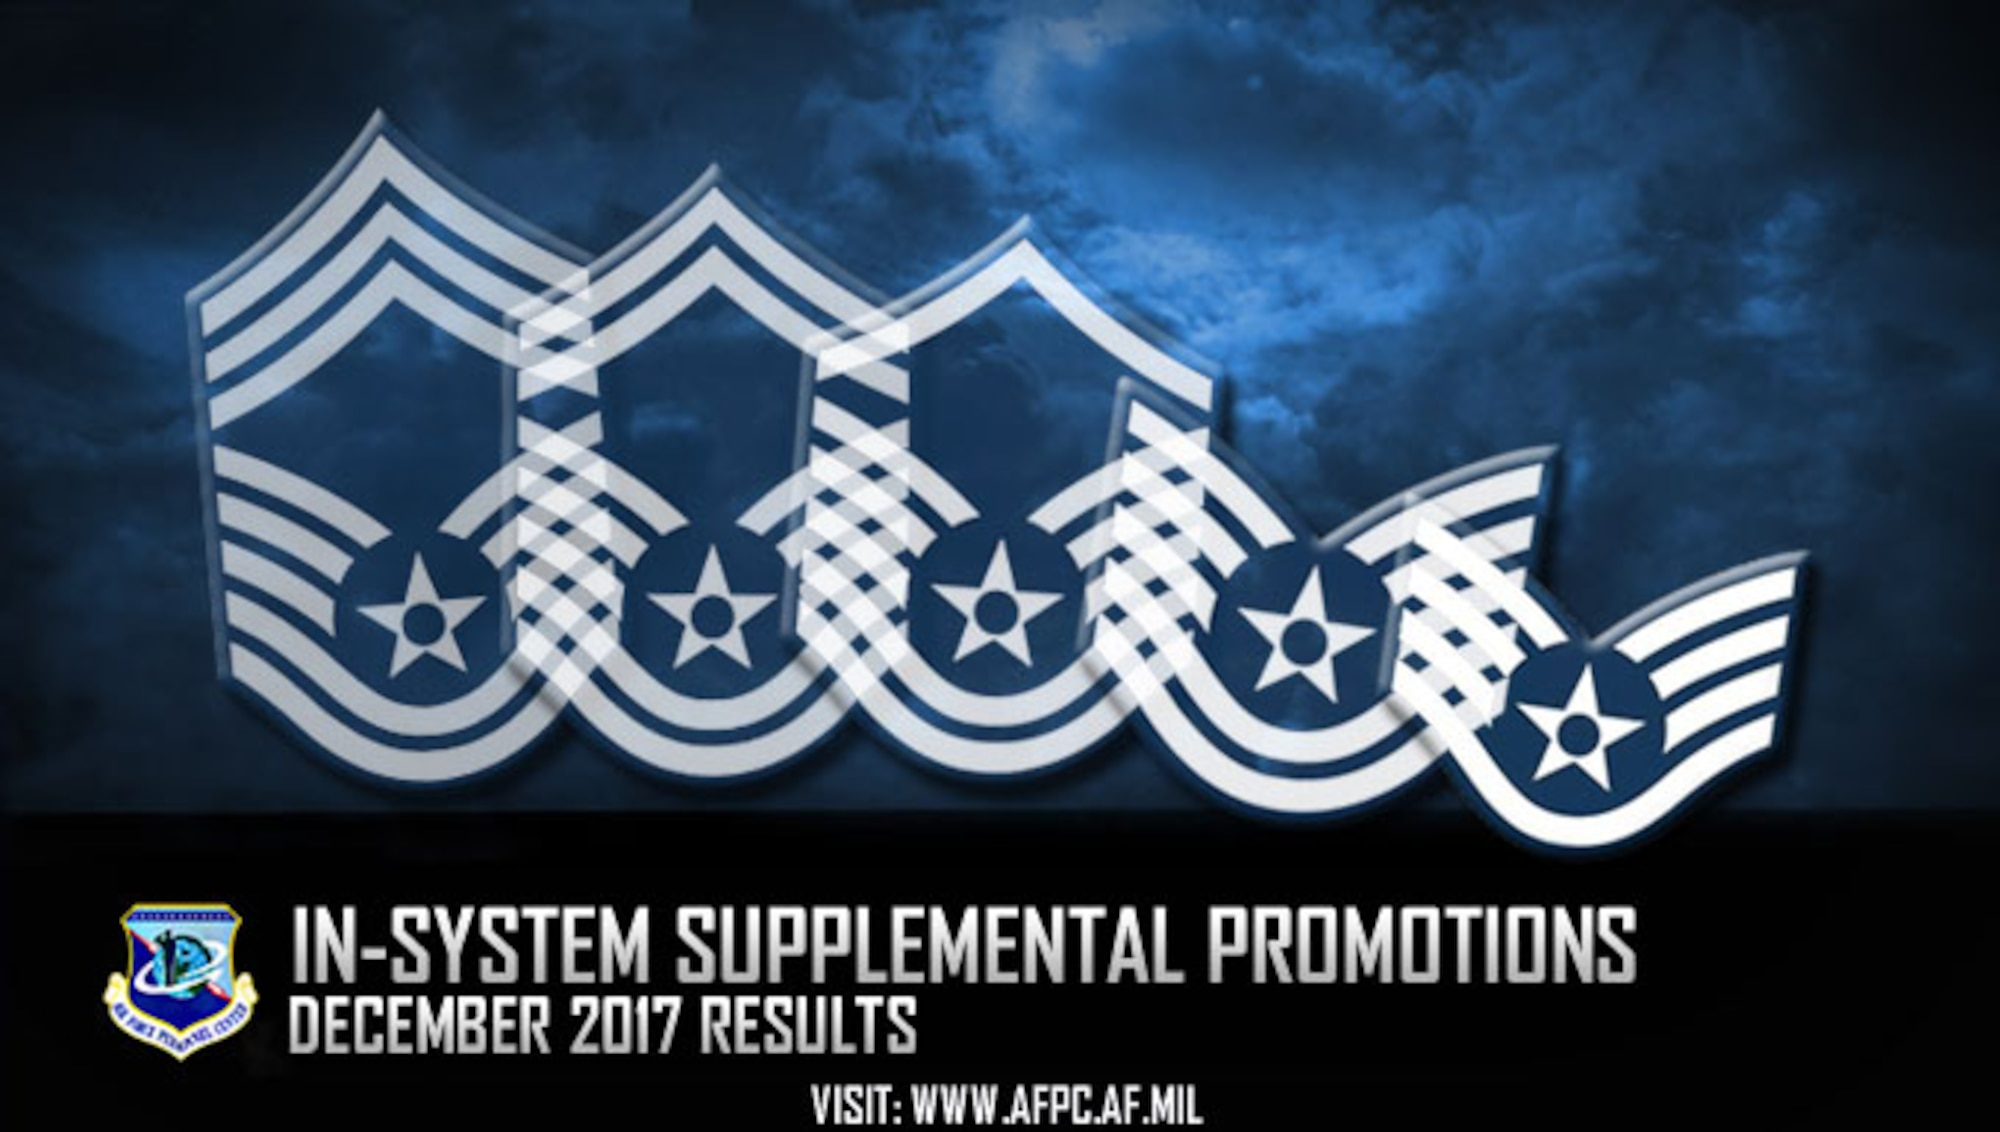 December 2017 in-system supplemental results